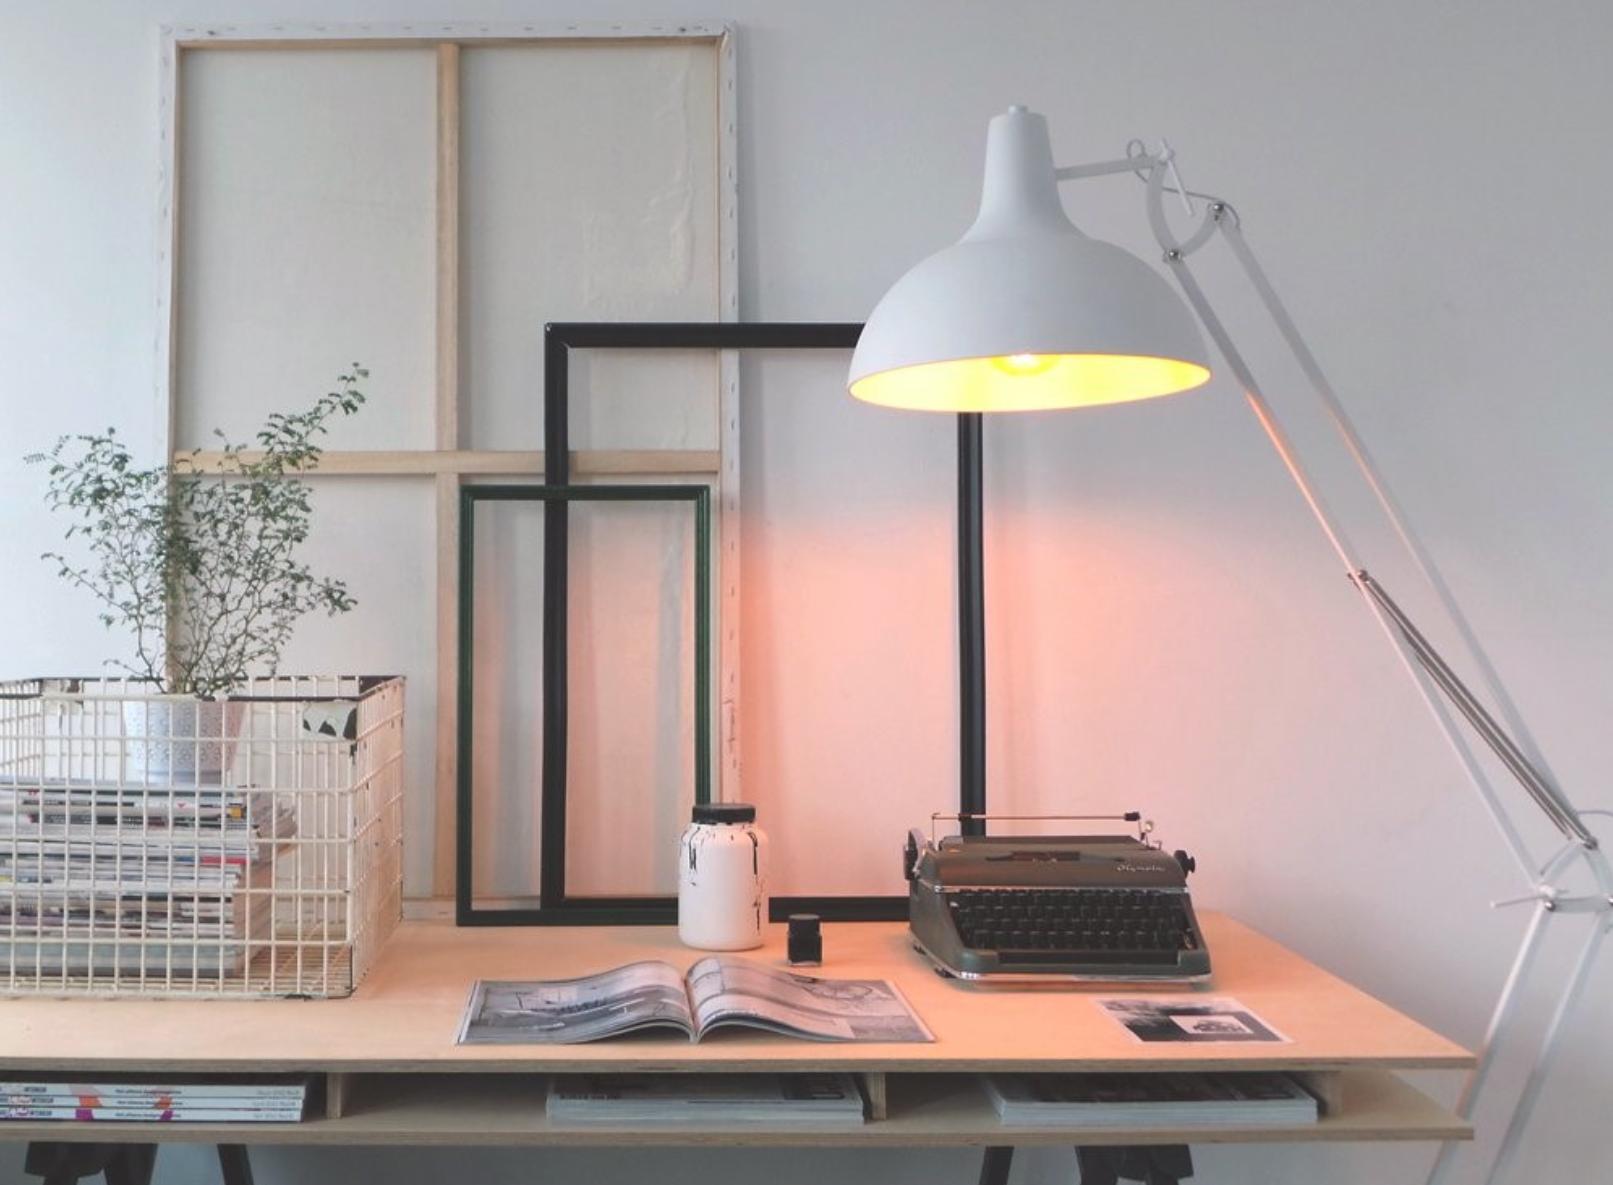 Comment puis je assombrir ma lampe ? blog lampesenligne.fr